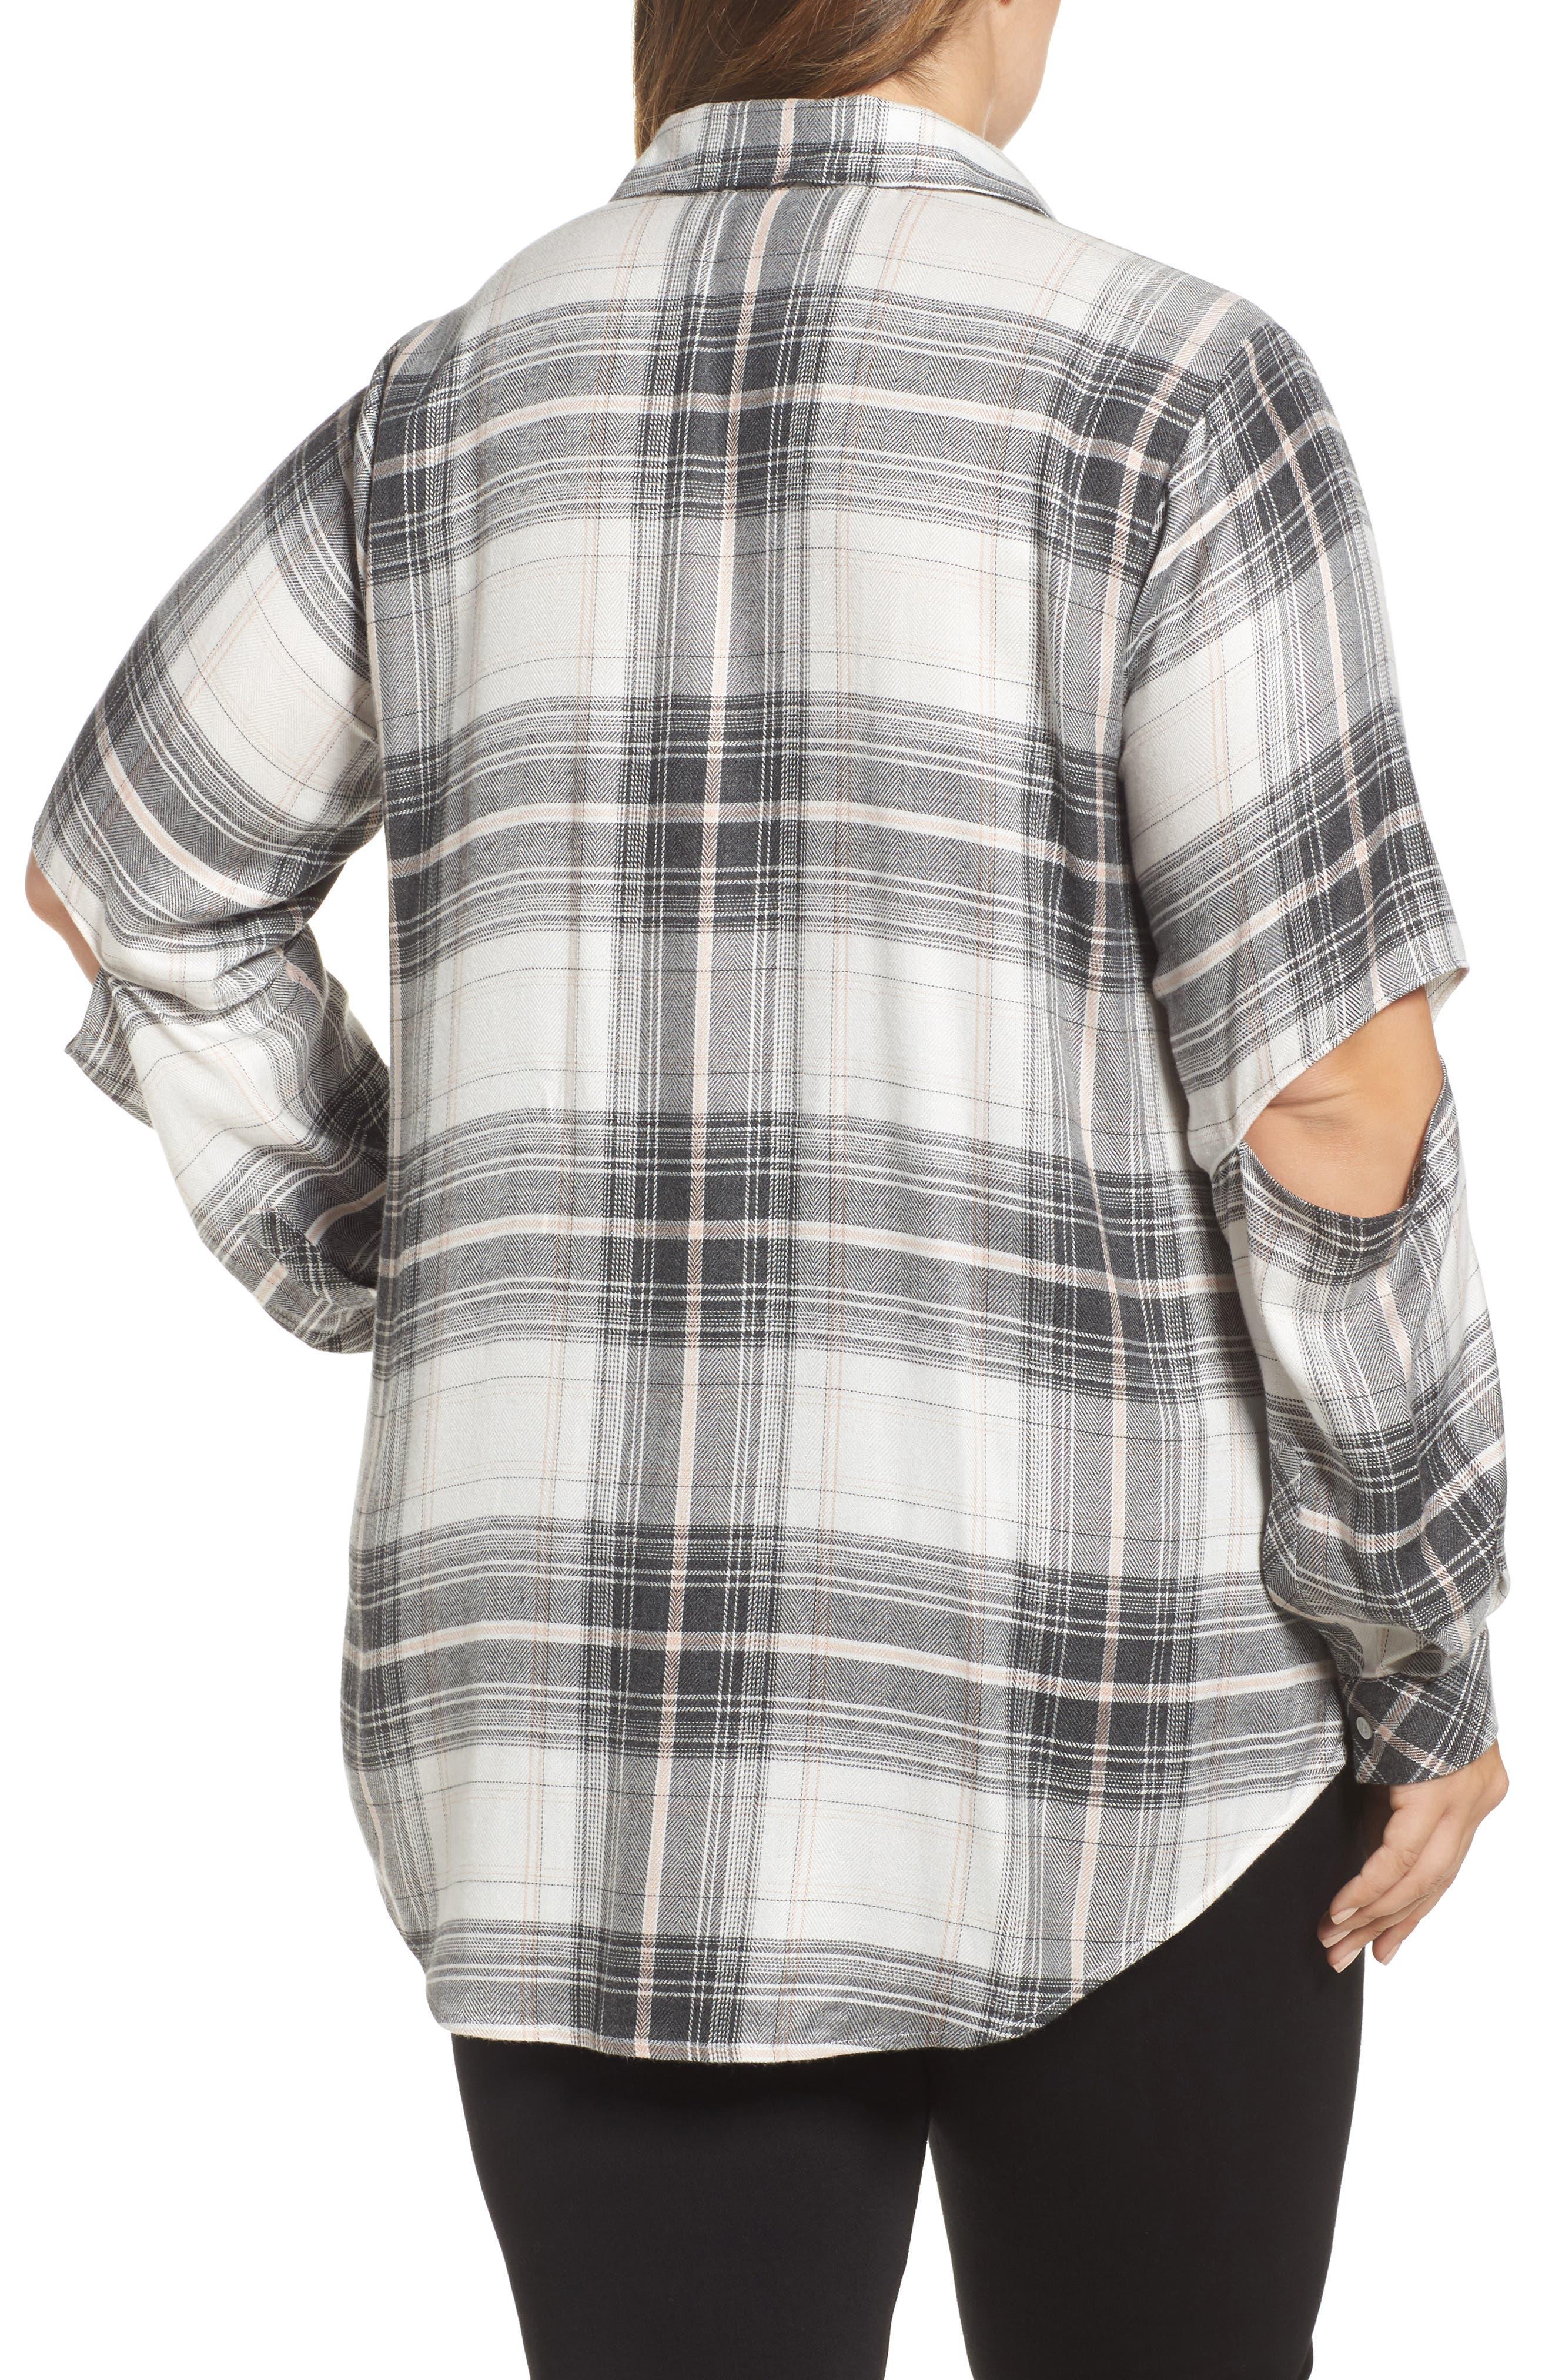 Cold Elbow Linearscape Plaid Shirt,                             Alternate thumbnail 2, color,                             669